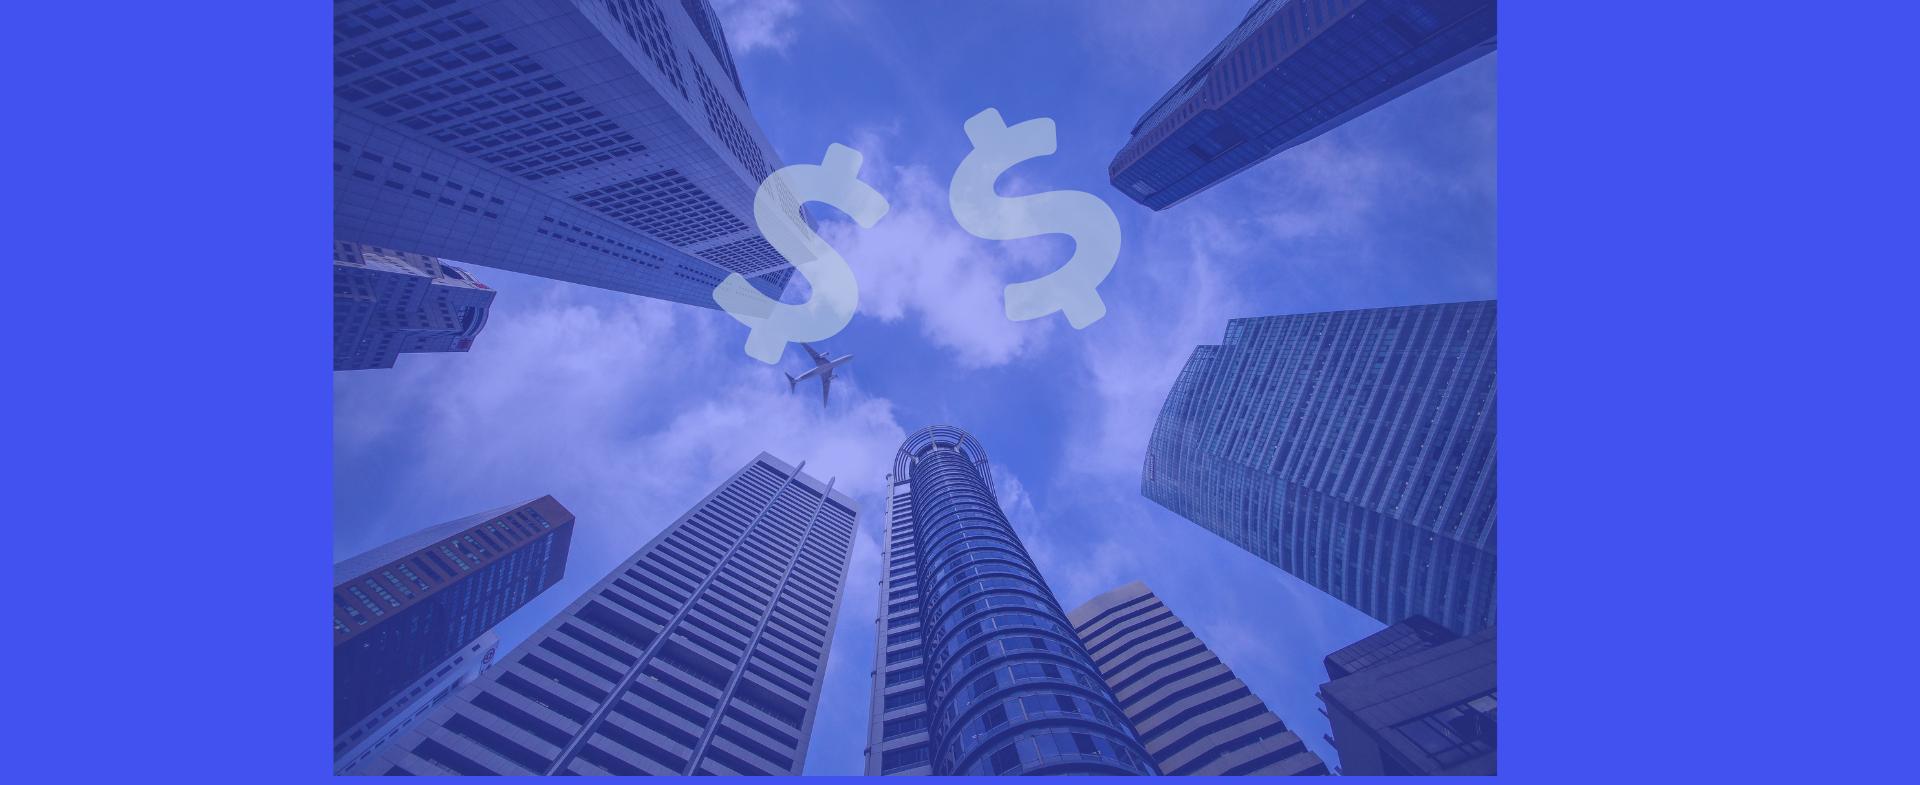 LATAM Venture Capital Powerhouse Raises $600M Across Two Funds